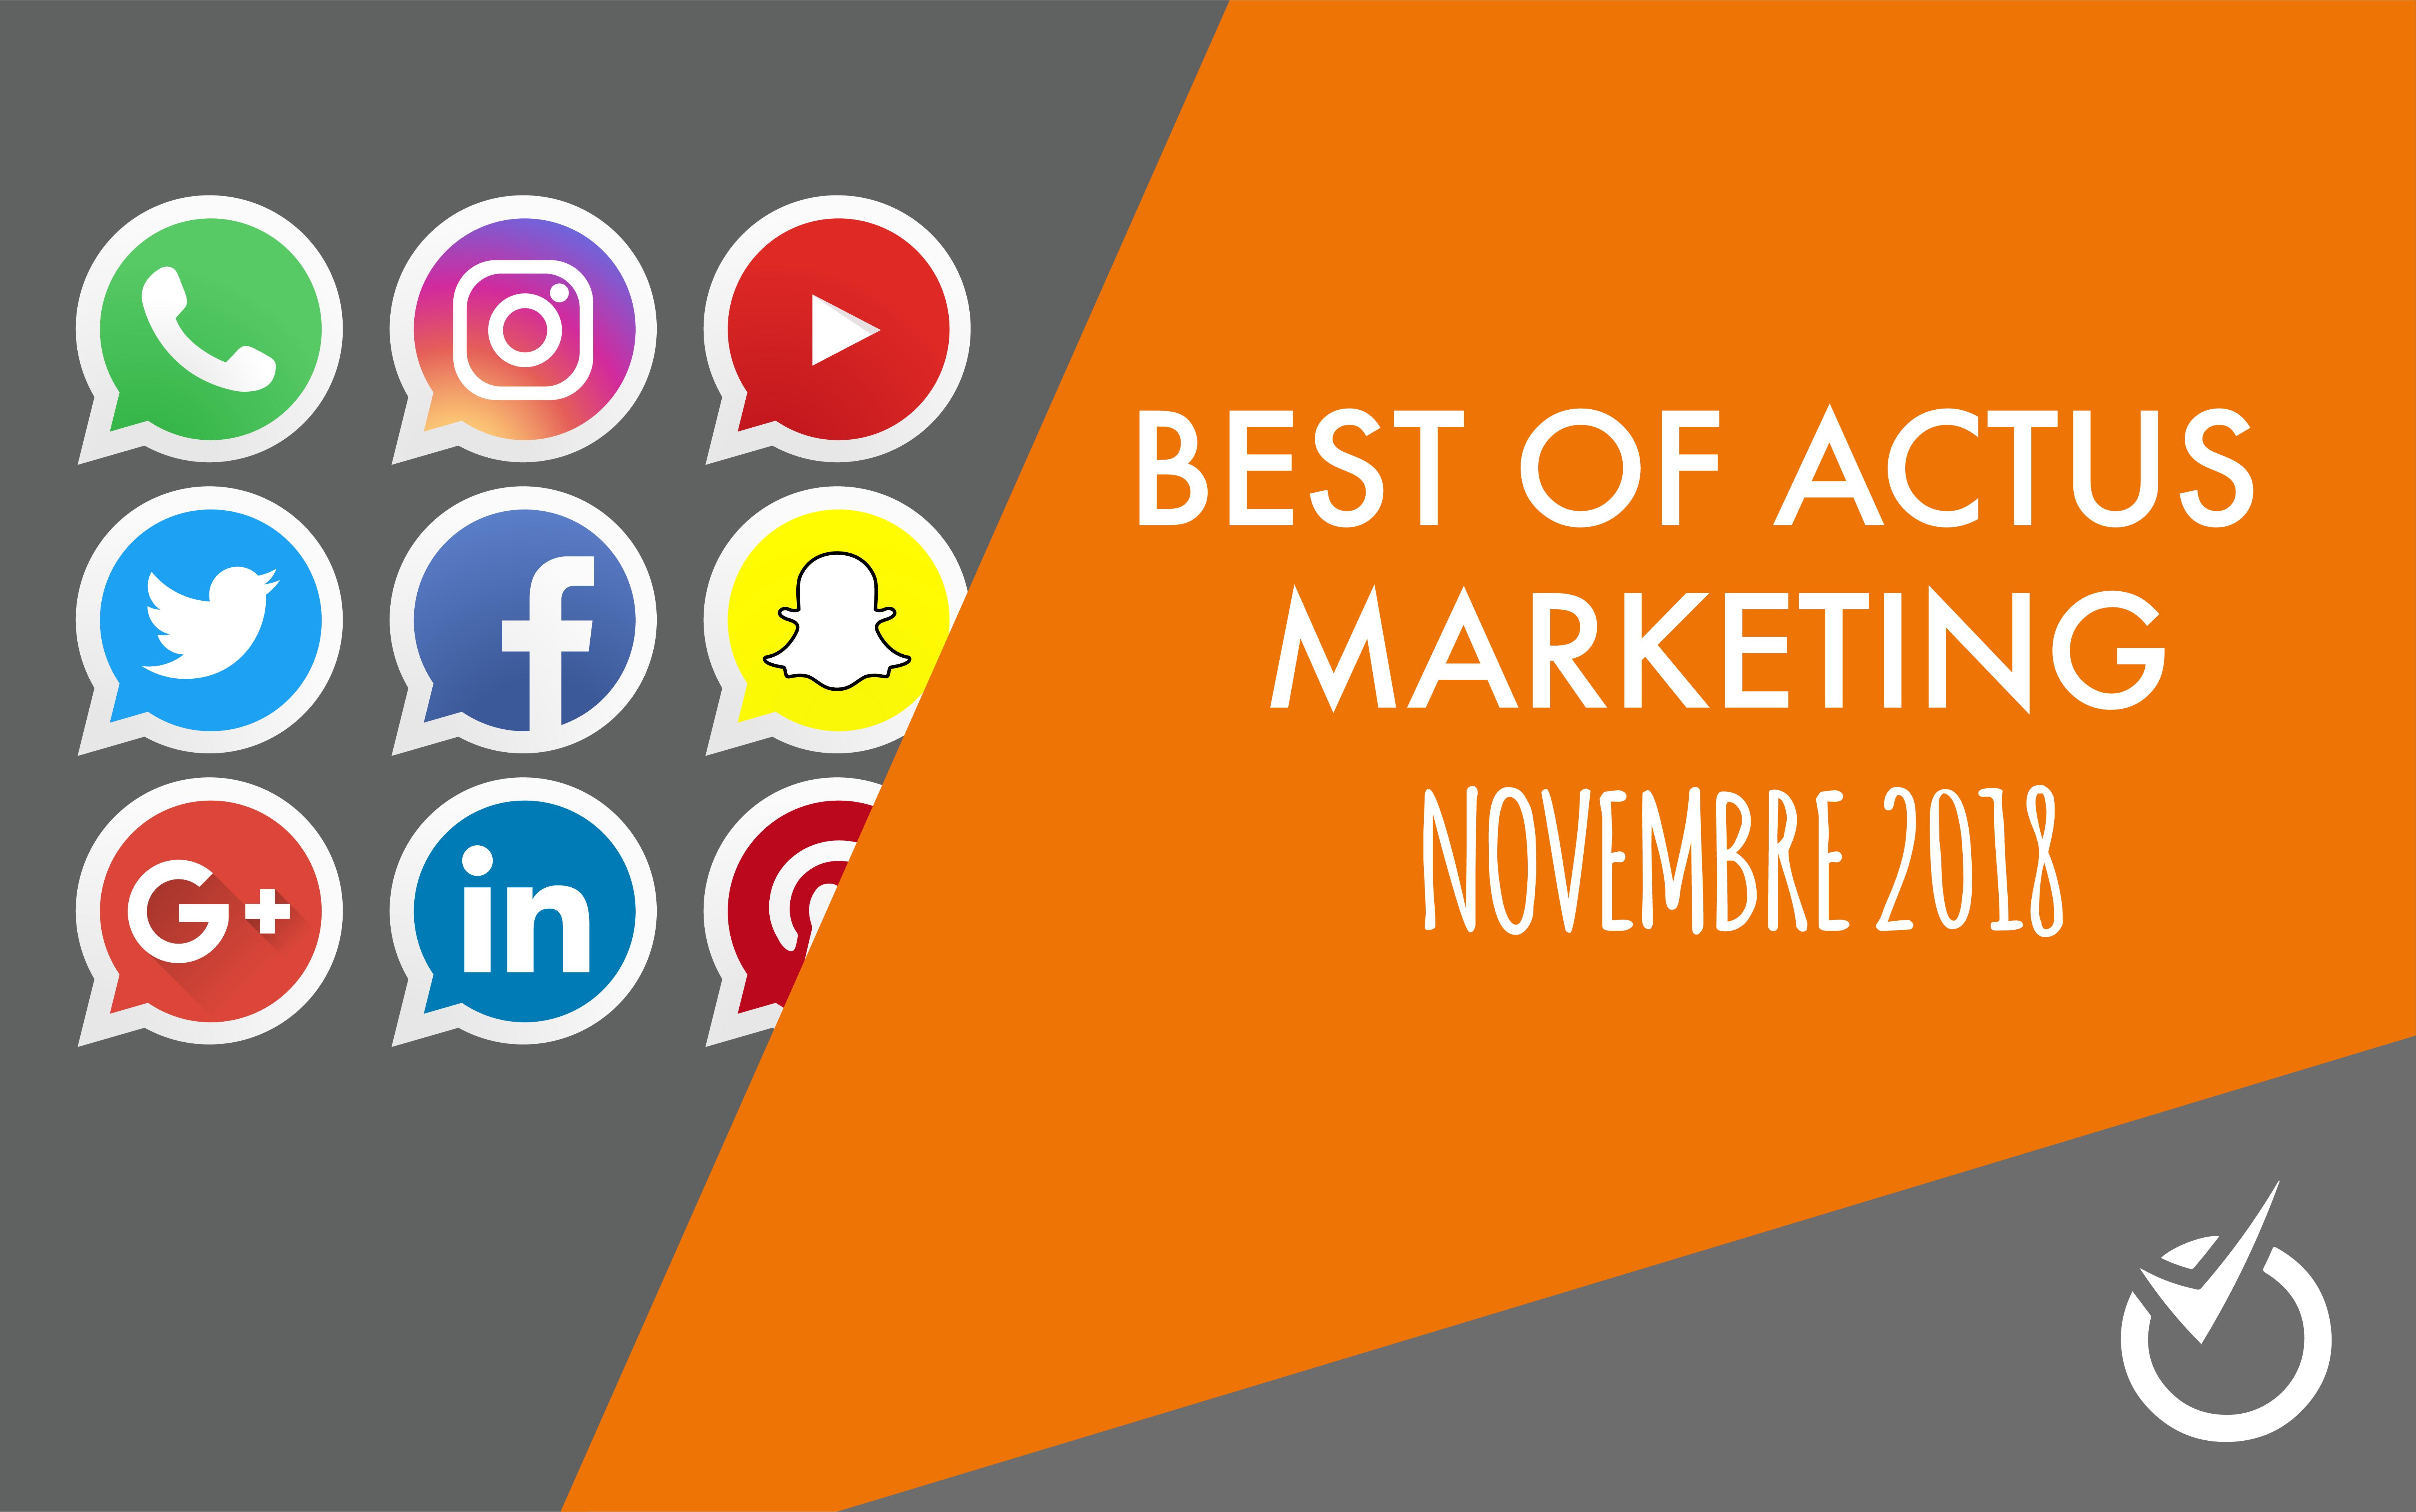 best of actu marketing novembre